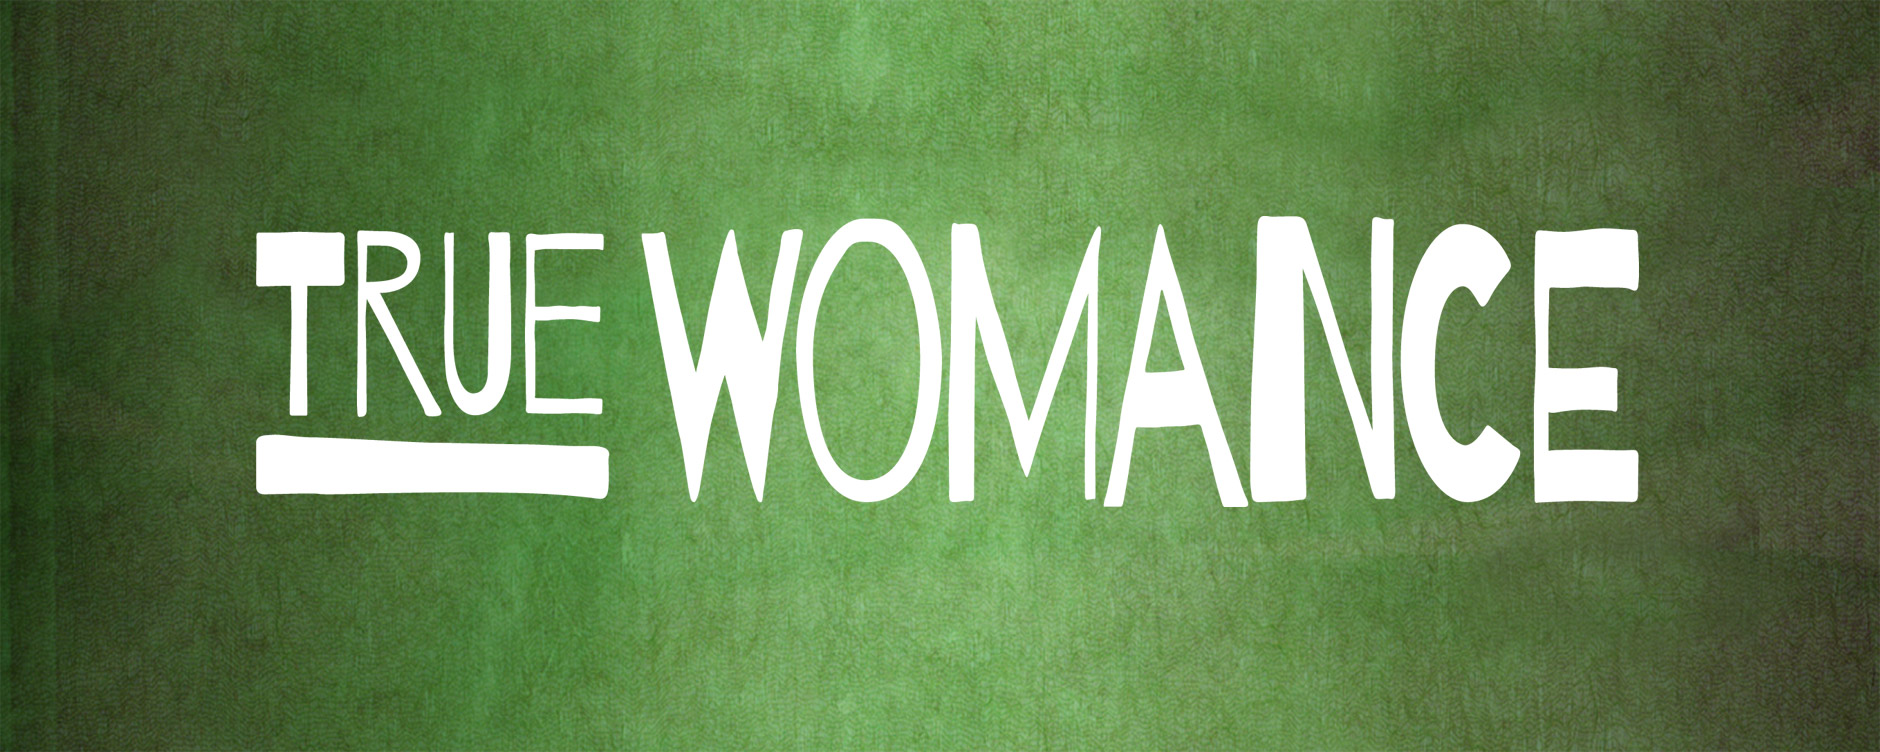 True Womance